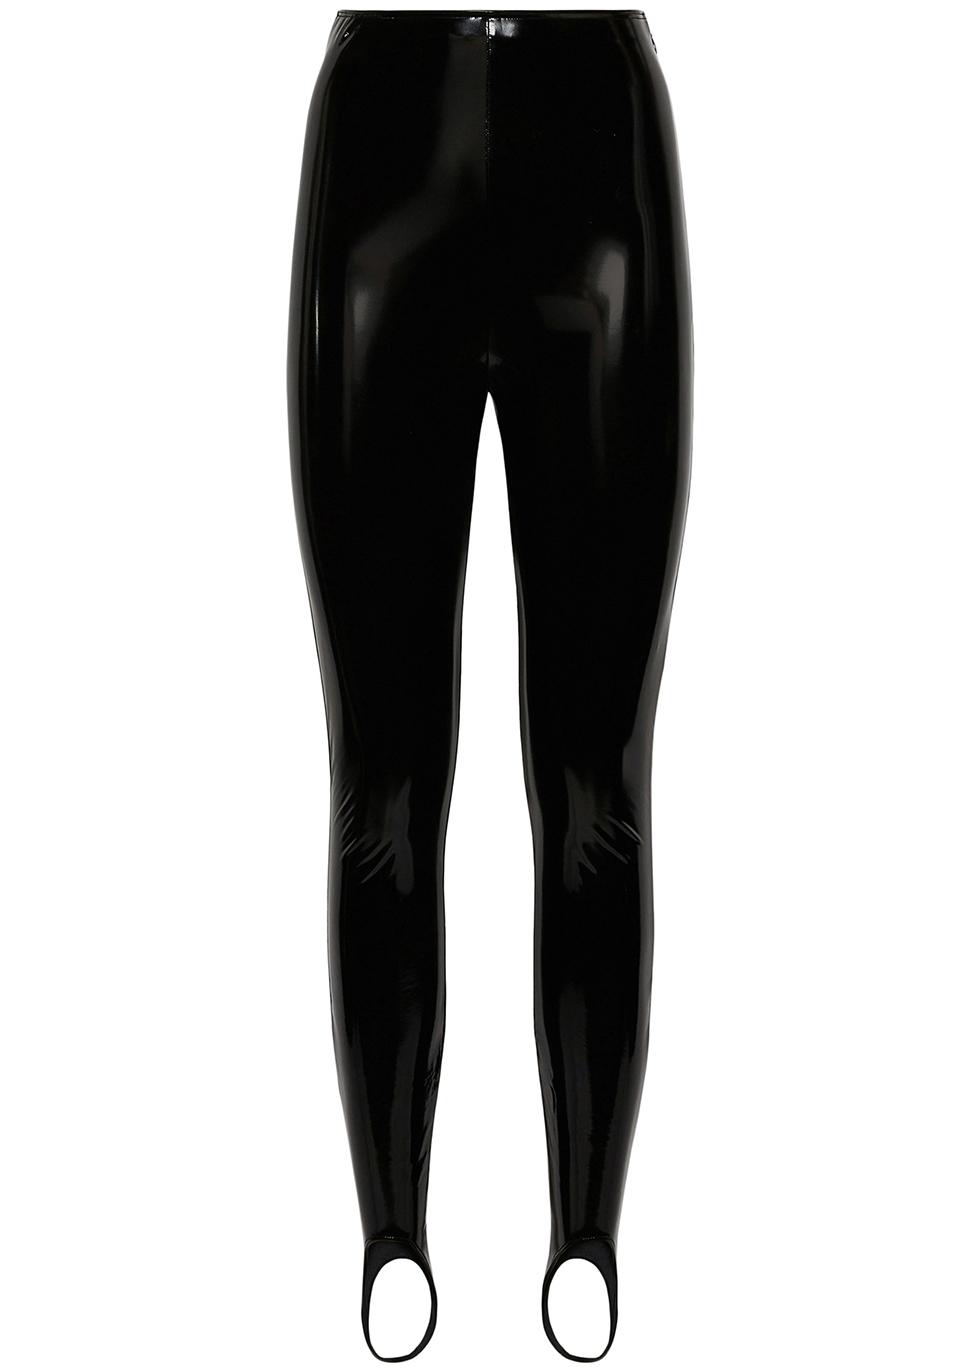 Black latex stirrup leggings